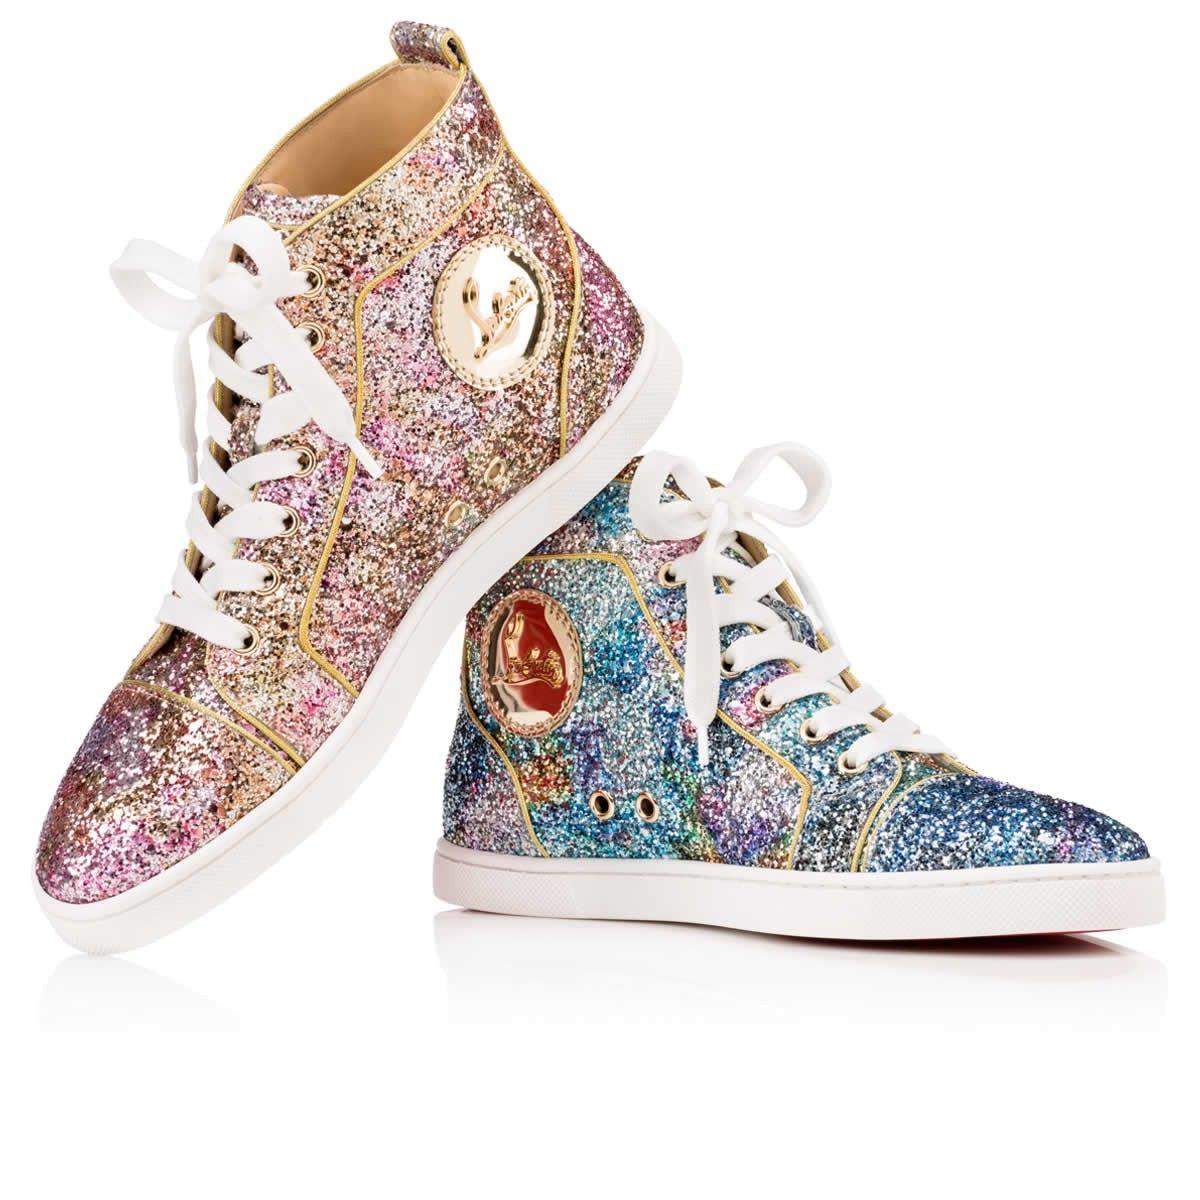 top design genuine shoes temperament shoes Christian Louboutin Bip Bip Women's Version Horizon Glitter | Bip bip